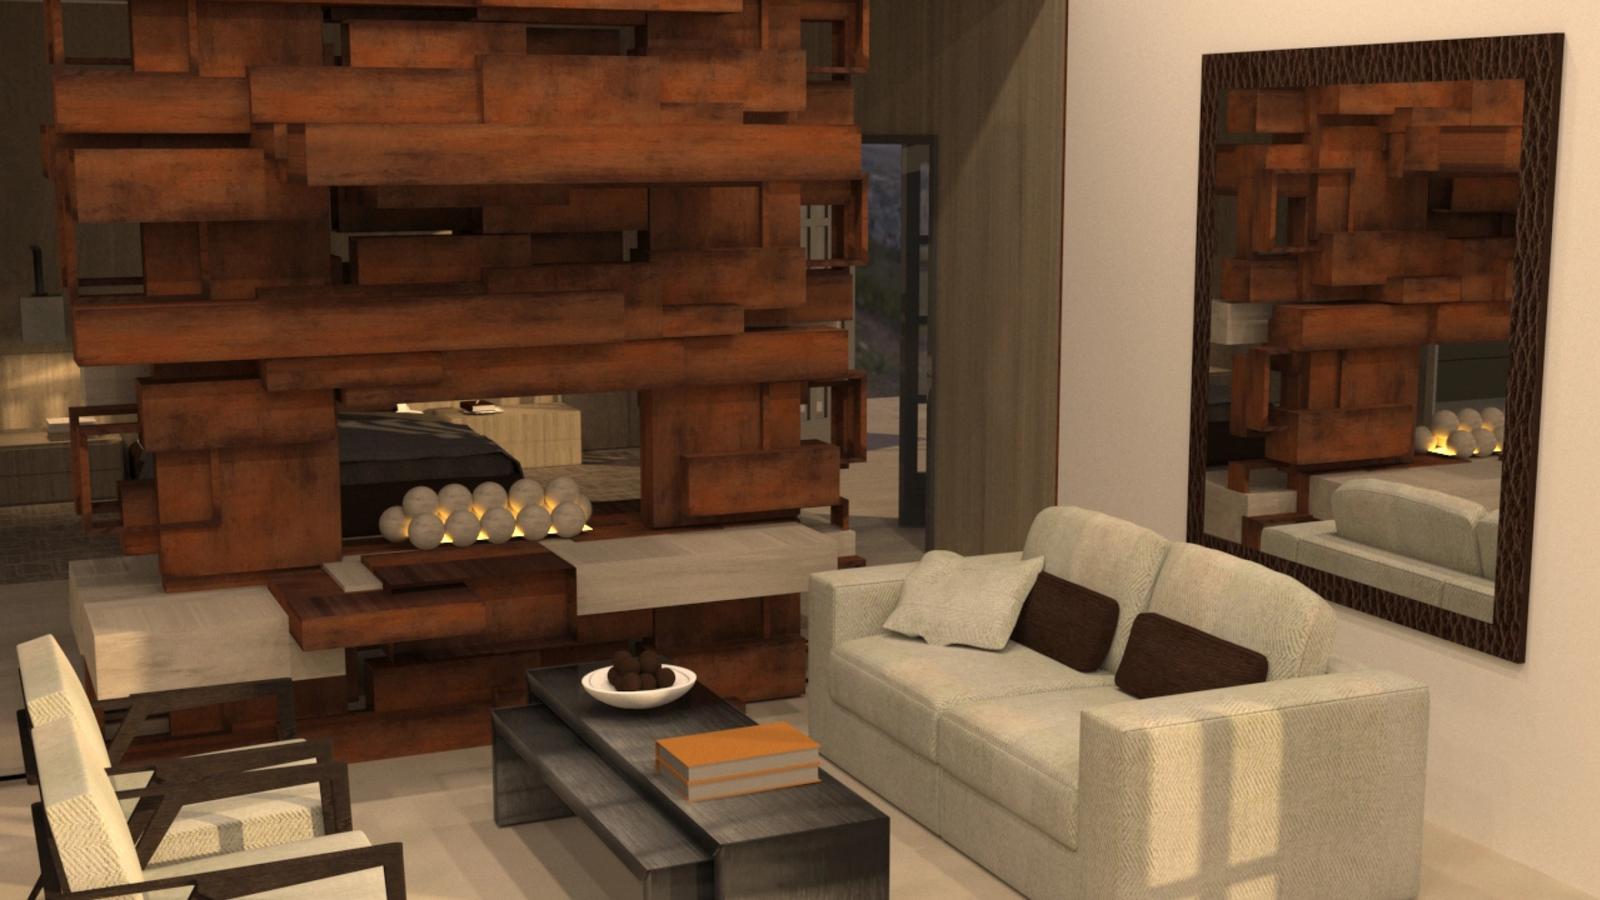 Artist Studio Loft - Living Room in the Evening